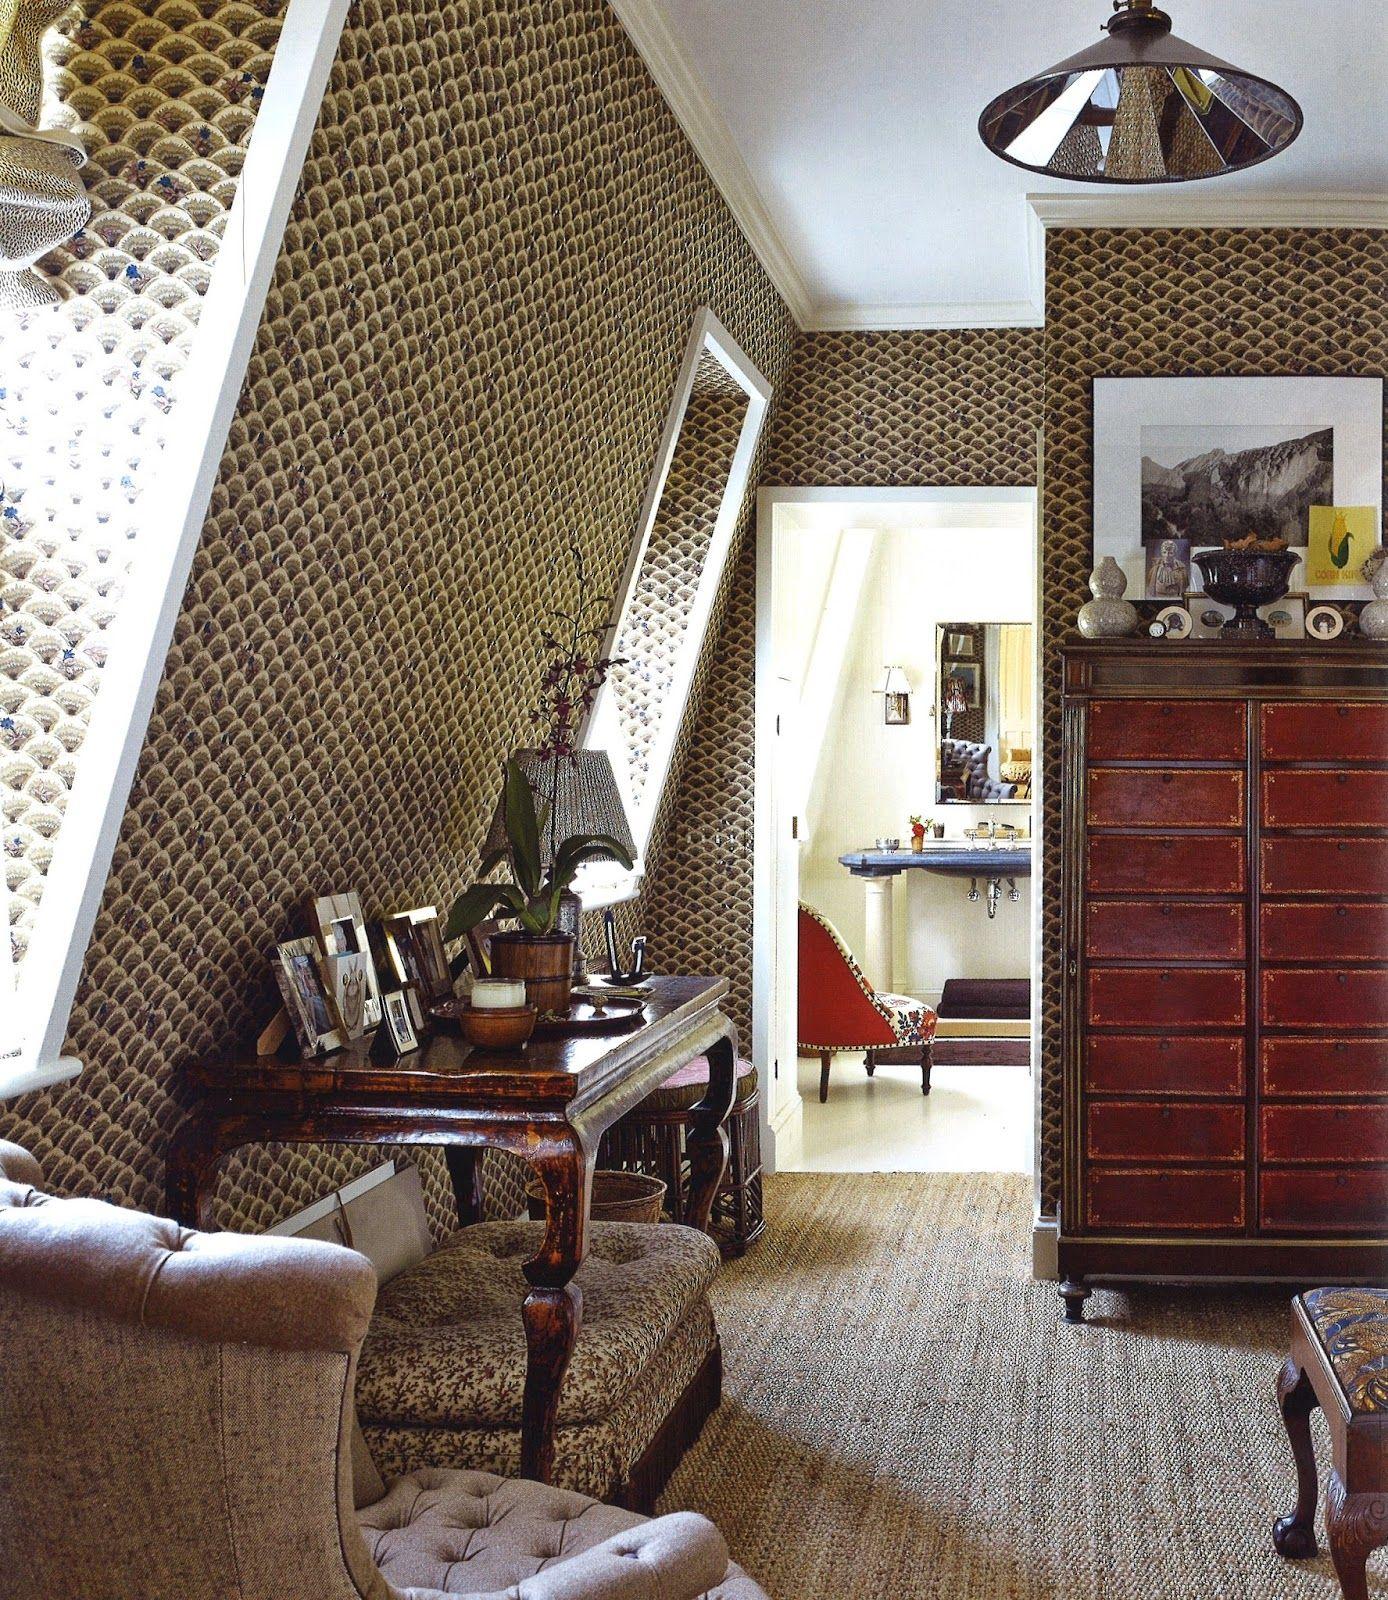 Markham Roberts dressing room via architect design™